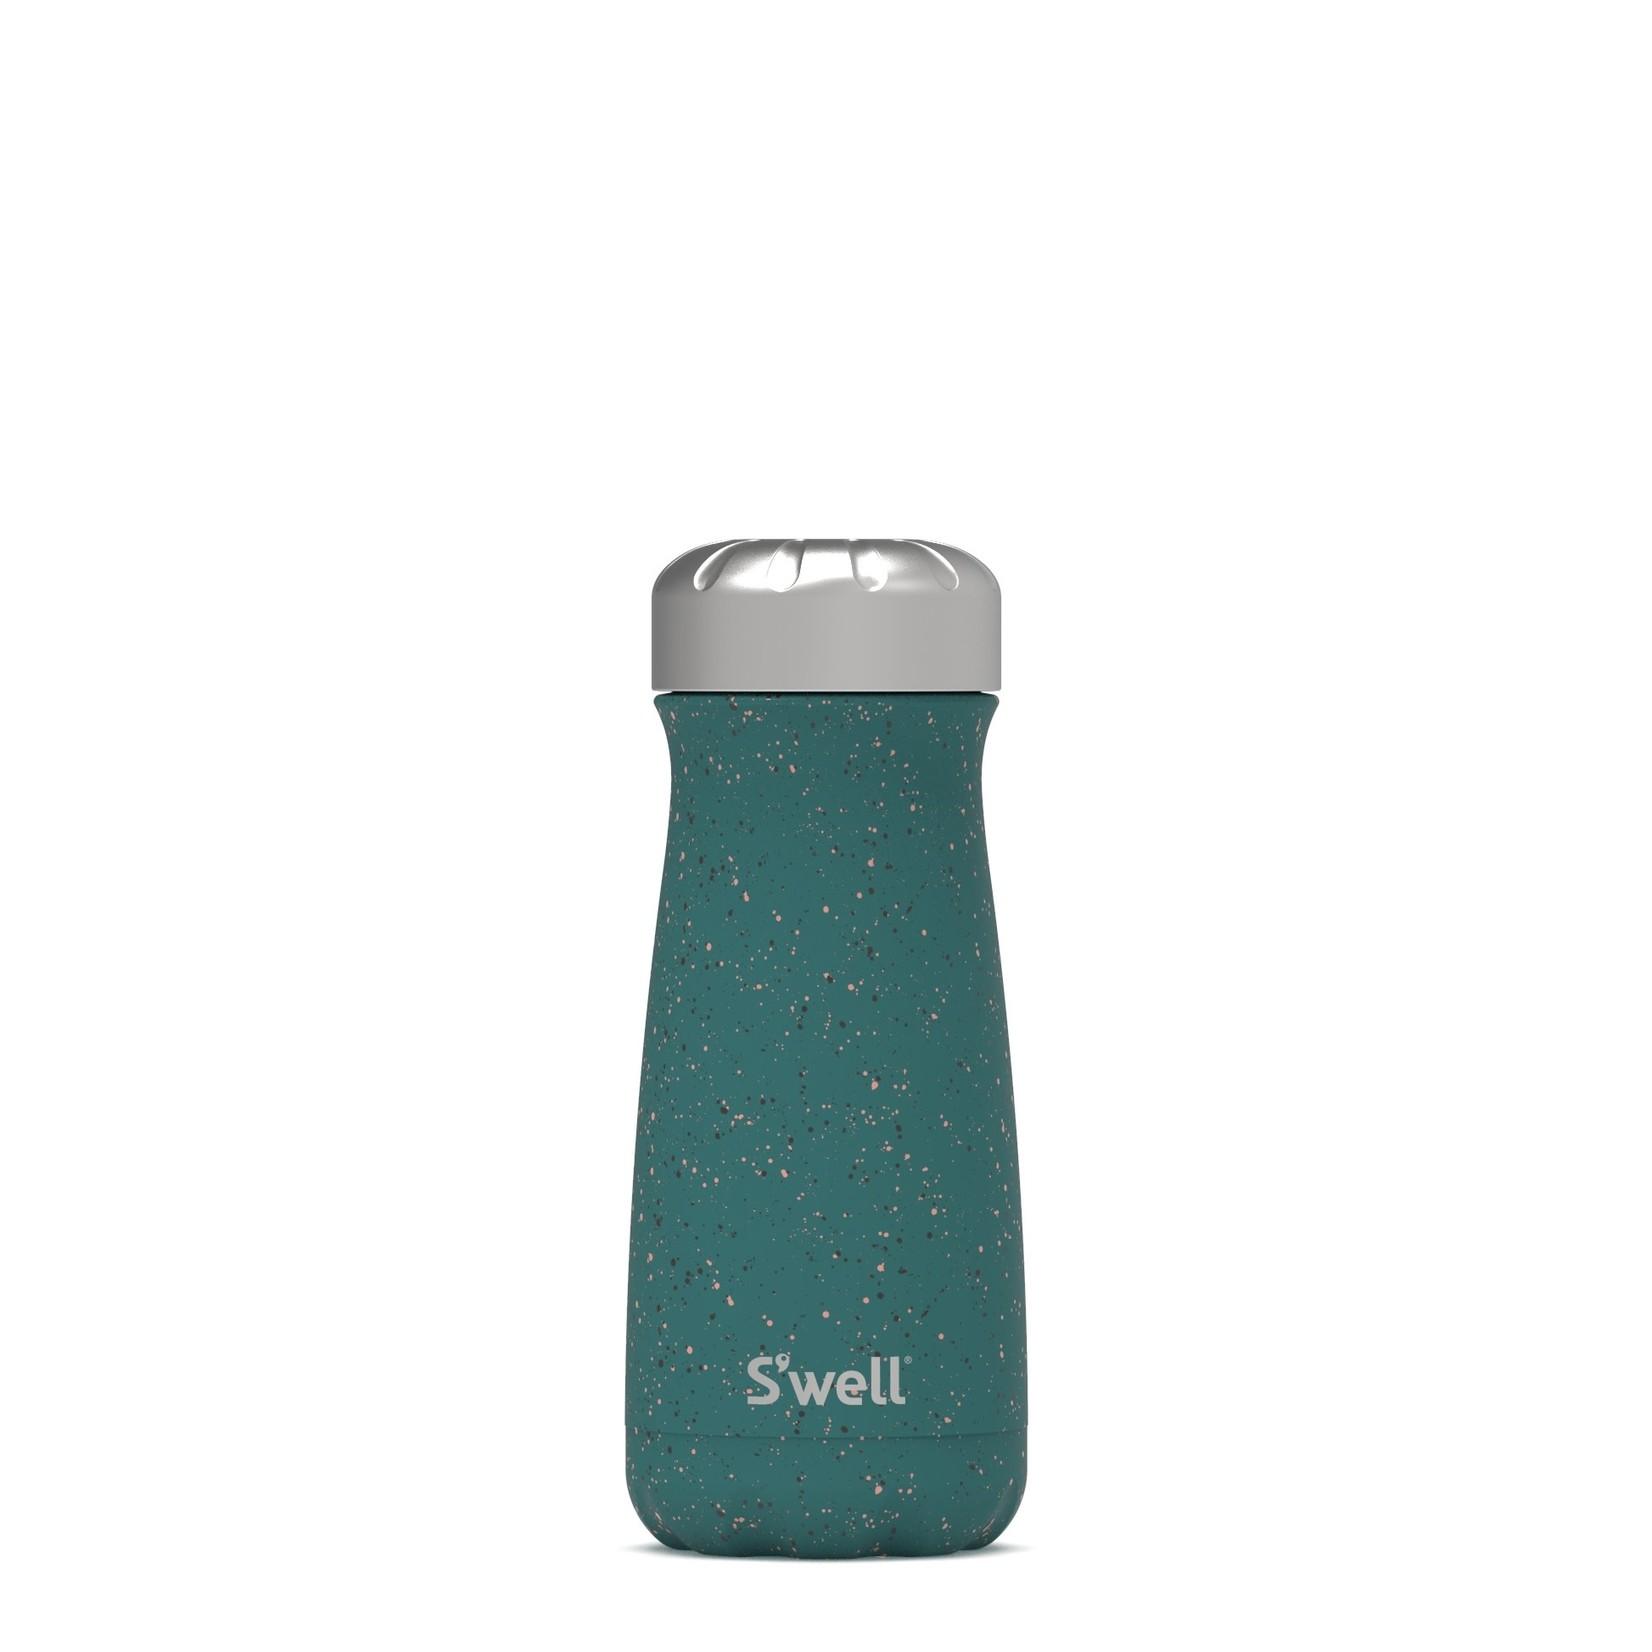 S'well Traveler Water Bottle by S'well Bottle